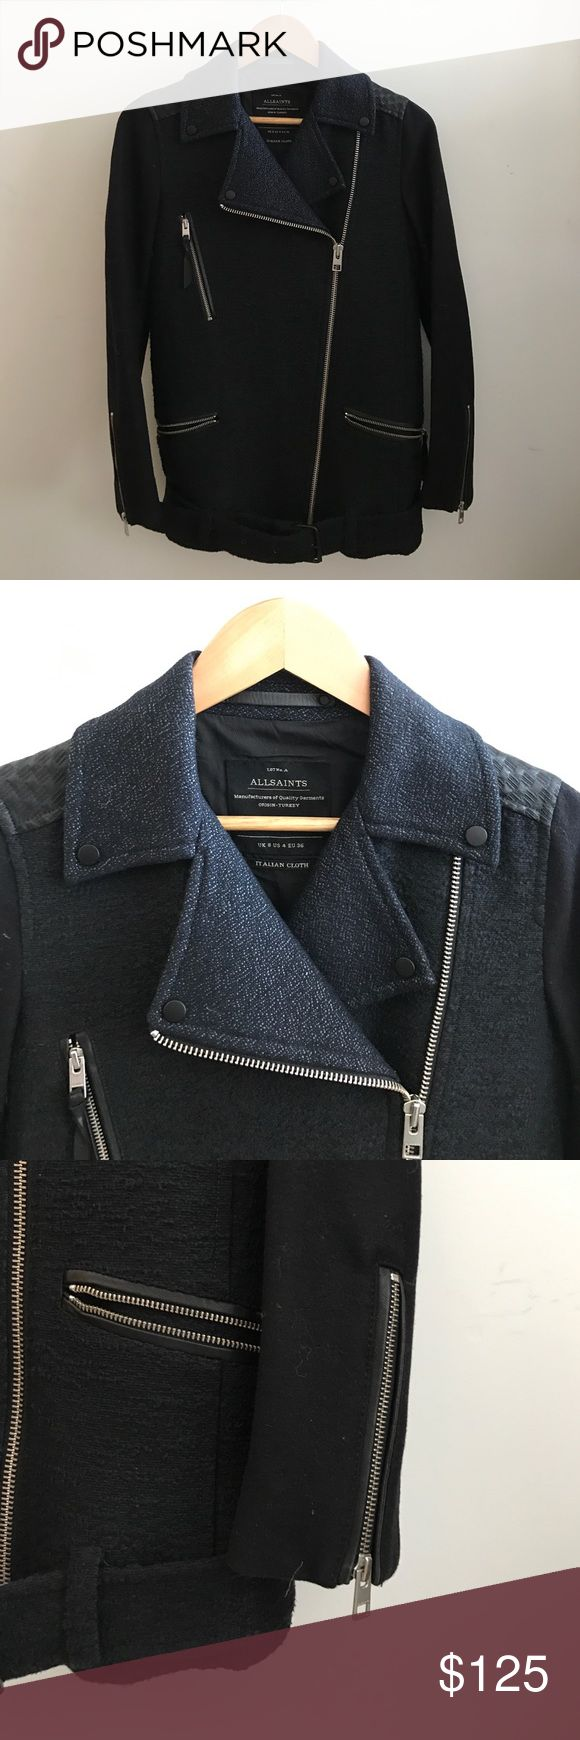 All Saints Wool/Cotton Moto Biker Jacket - 4 / S Navy blue allsaints moto jacket with zip closure and zips on sleeves / UK8 US4 EU36 / very very lightly worn All Saints Jackets & Coats